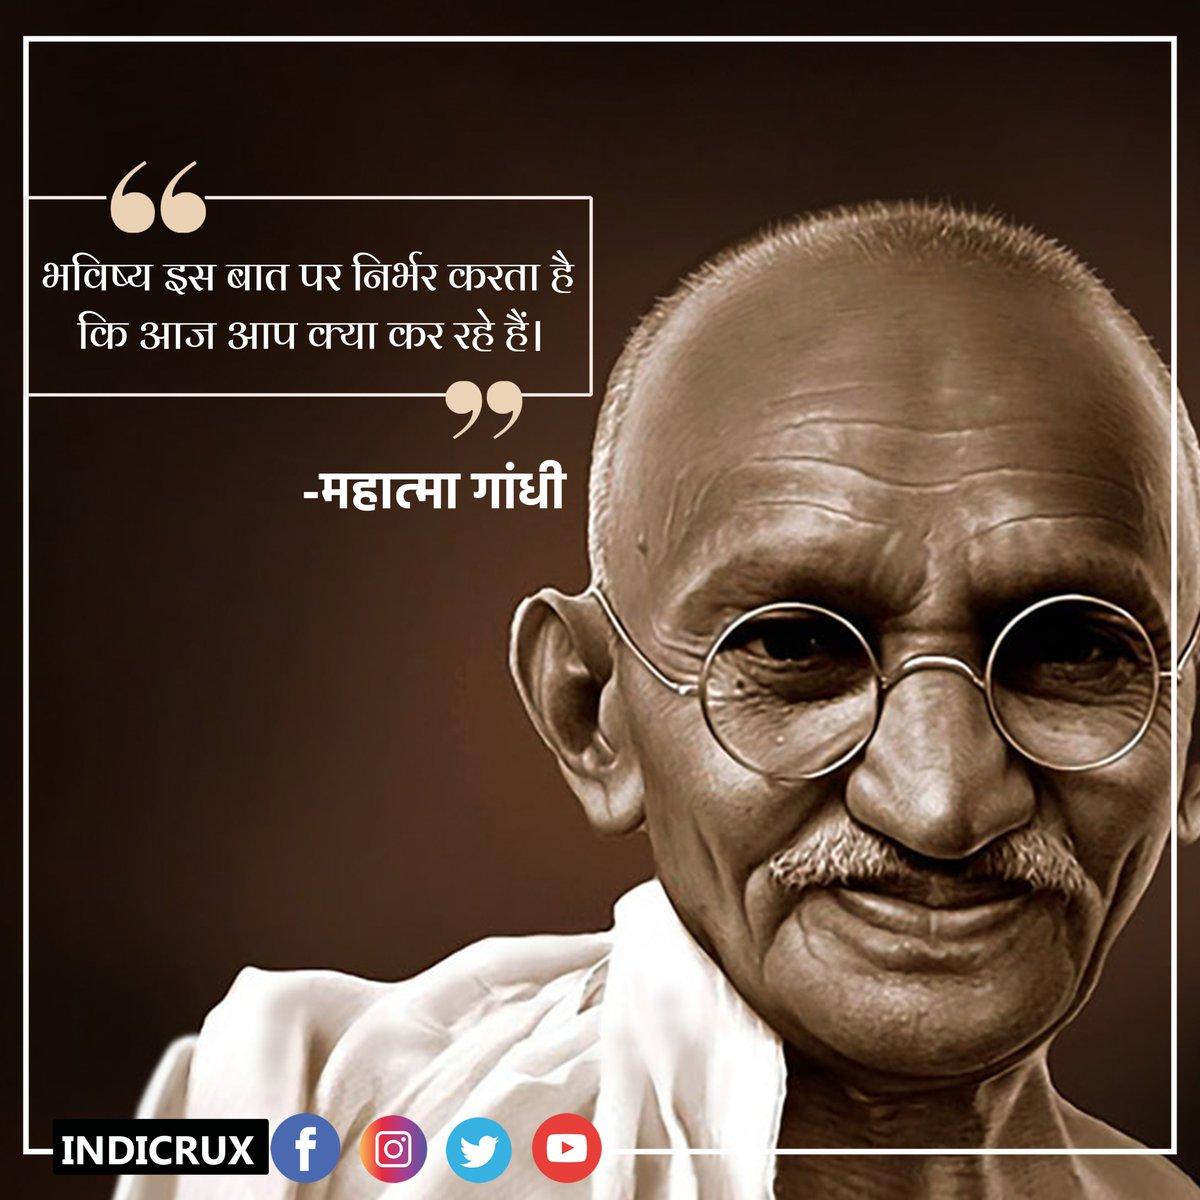 भविष्य इस बात पर निर्भर करता है कि आज आप क्या कर रहे हैं। ... #gandhiji #gandhi #mahatmagandhi #india #gandhijayanti #gandhiquotes #freedom #indian #mahatma #fatherofthenation #peace #art #quotes #gandhijayanthi #bapu #fatherofnation #october #nonviolence